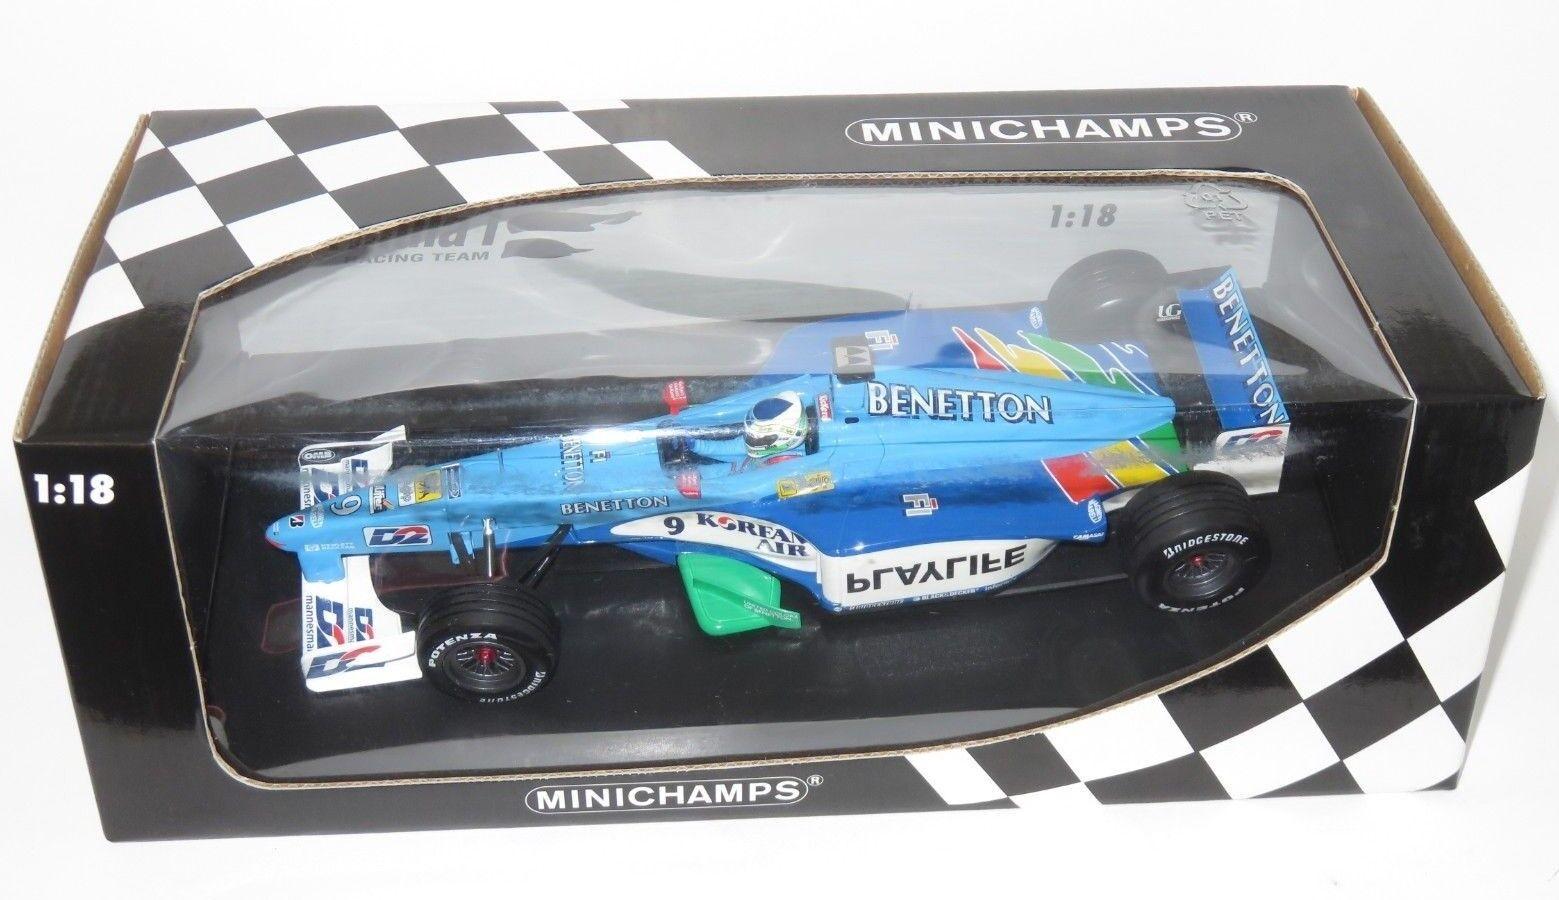 al precio mas bajo 1 1 1 18 Benetton Jugarlife B199 1999 temporada GianCochelo Ferrari  mejor vendido